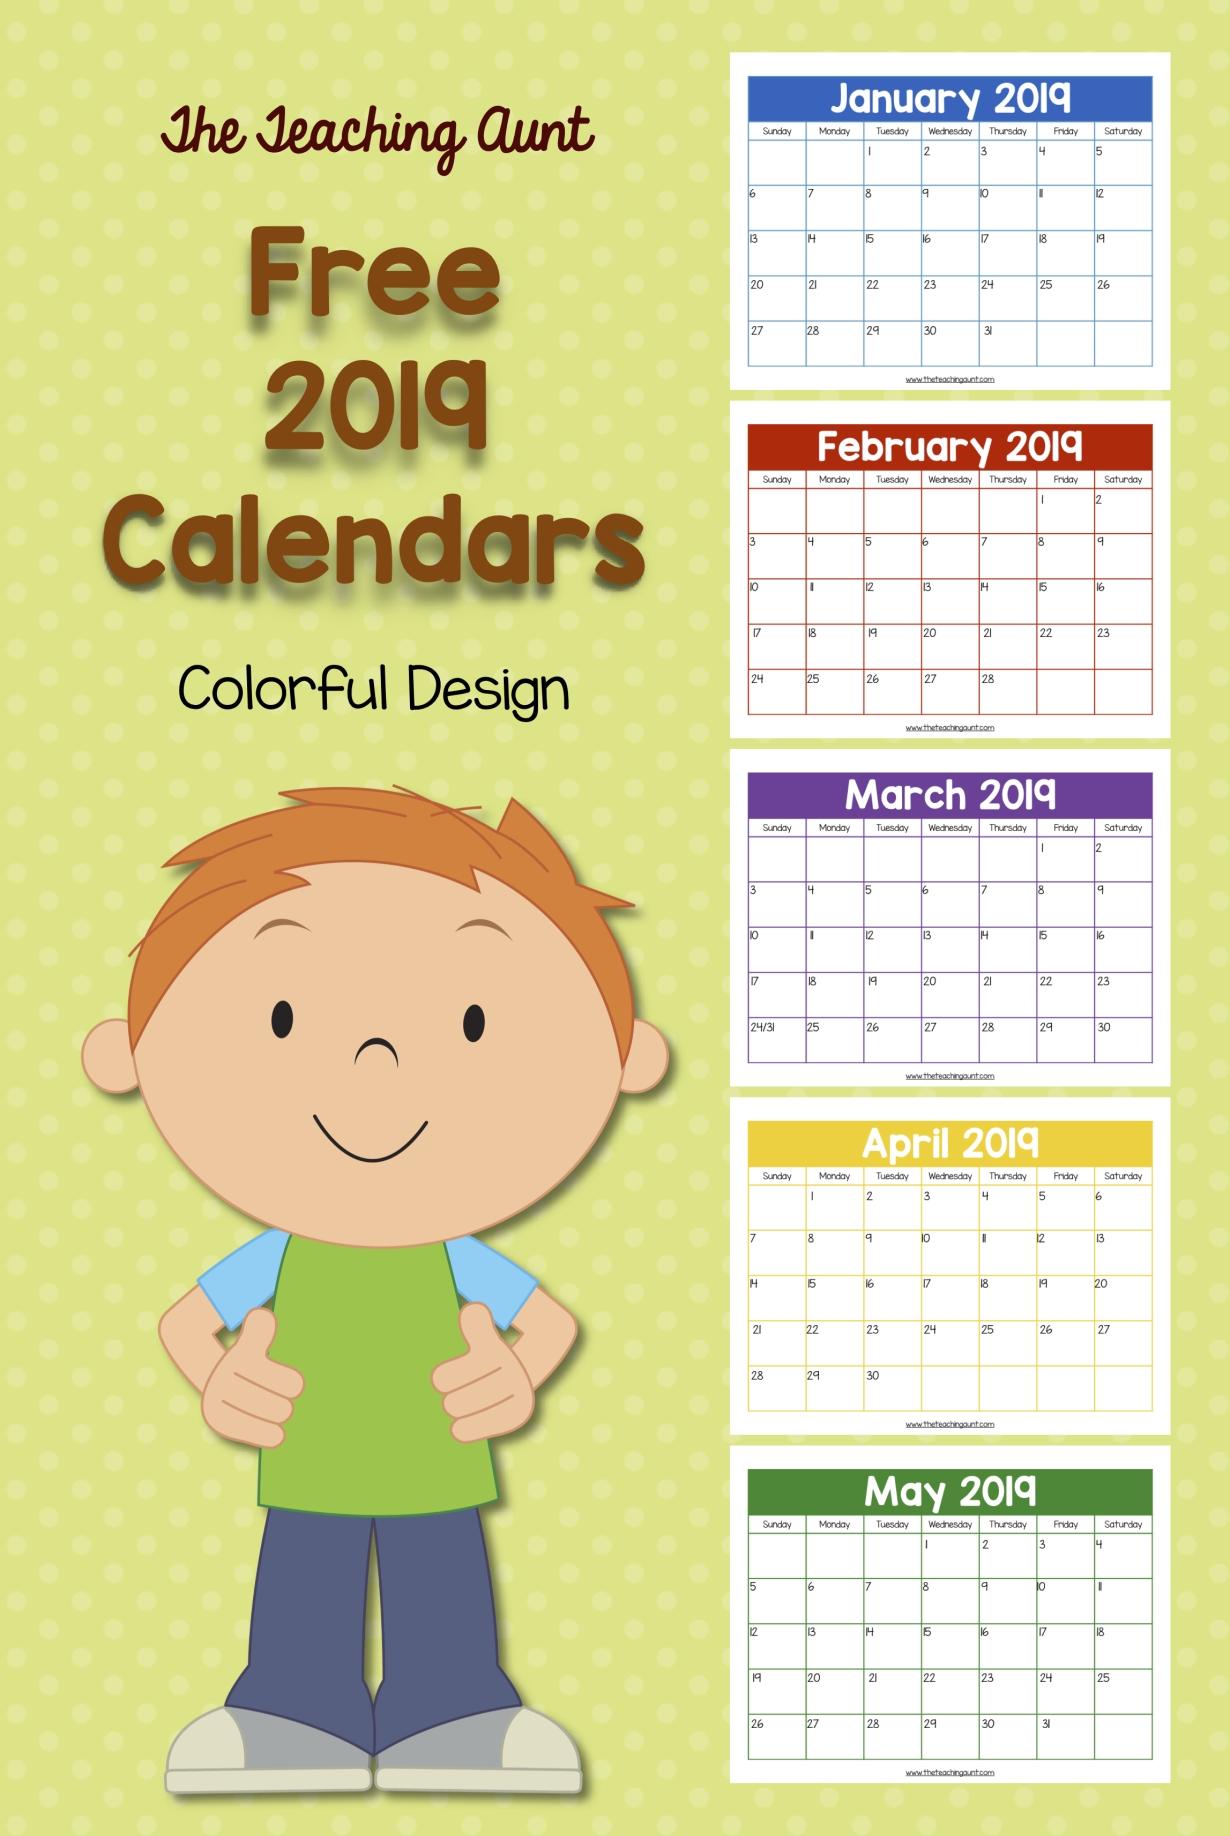 Free Colorful 2019 Calendar | Kids Calendar, Preschool